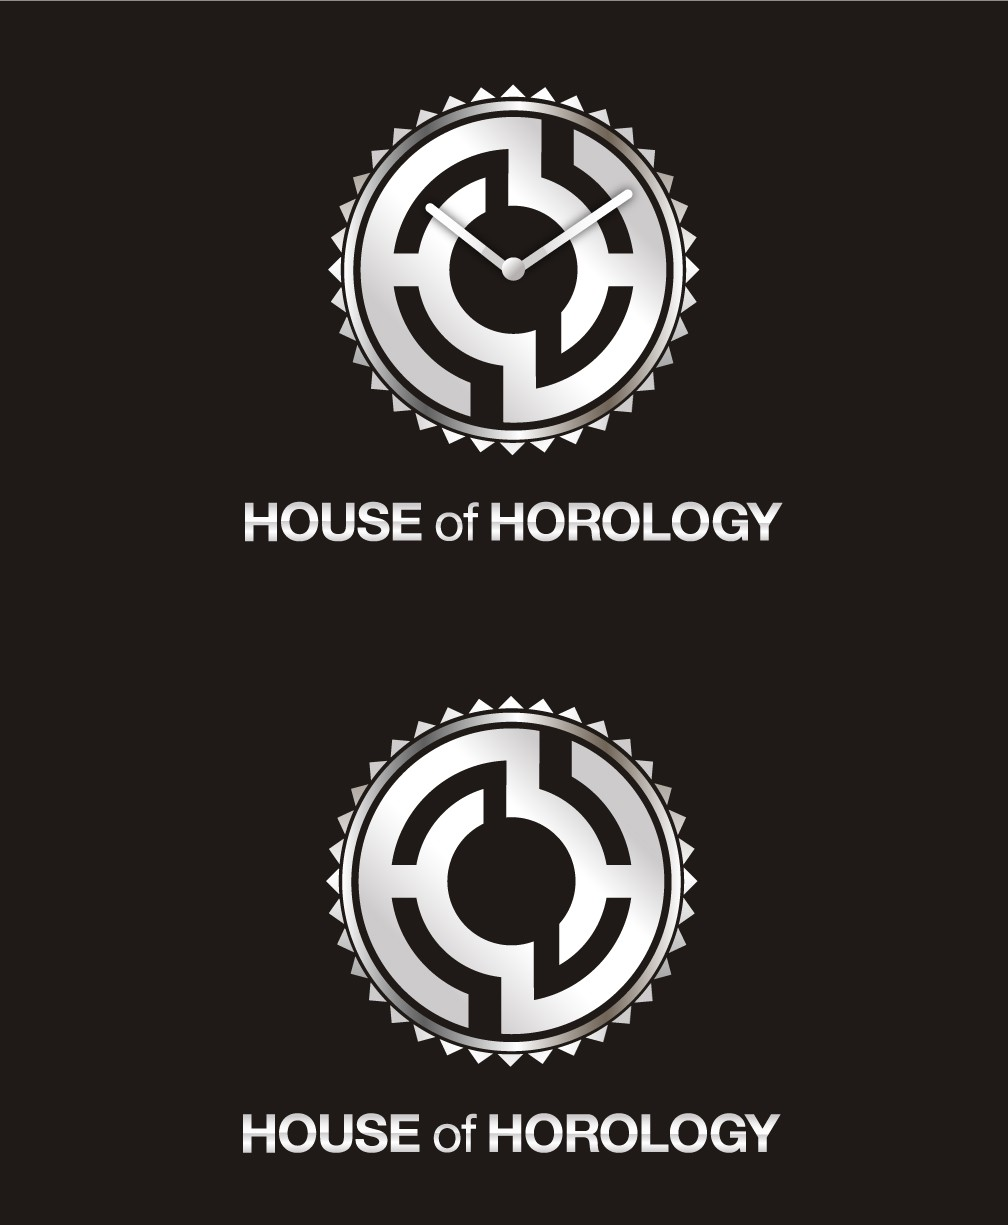 HOH : House of Horology (wristwatch company) NEEDS A LOGO